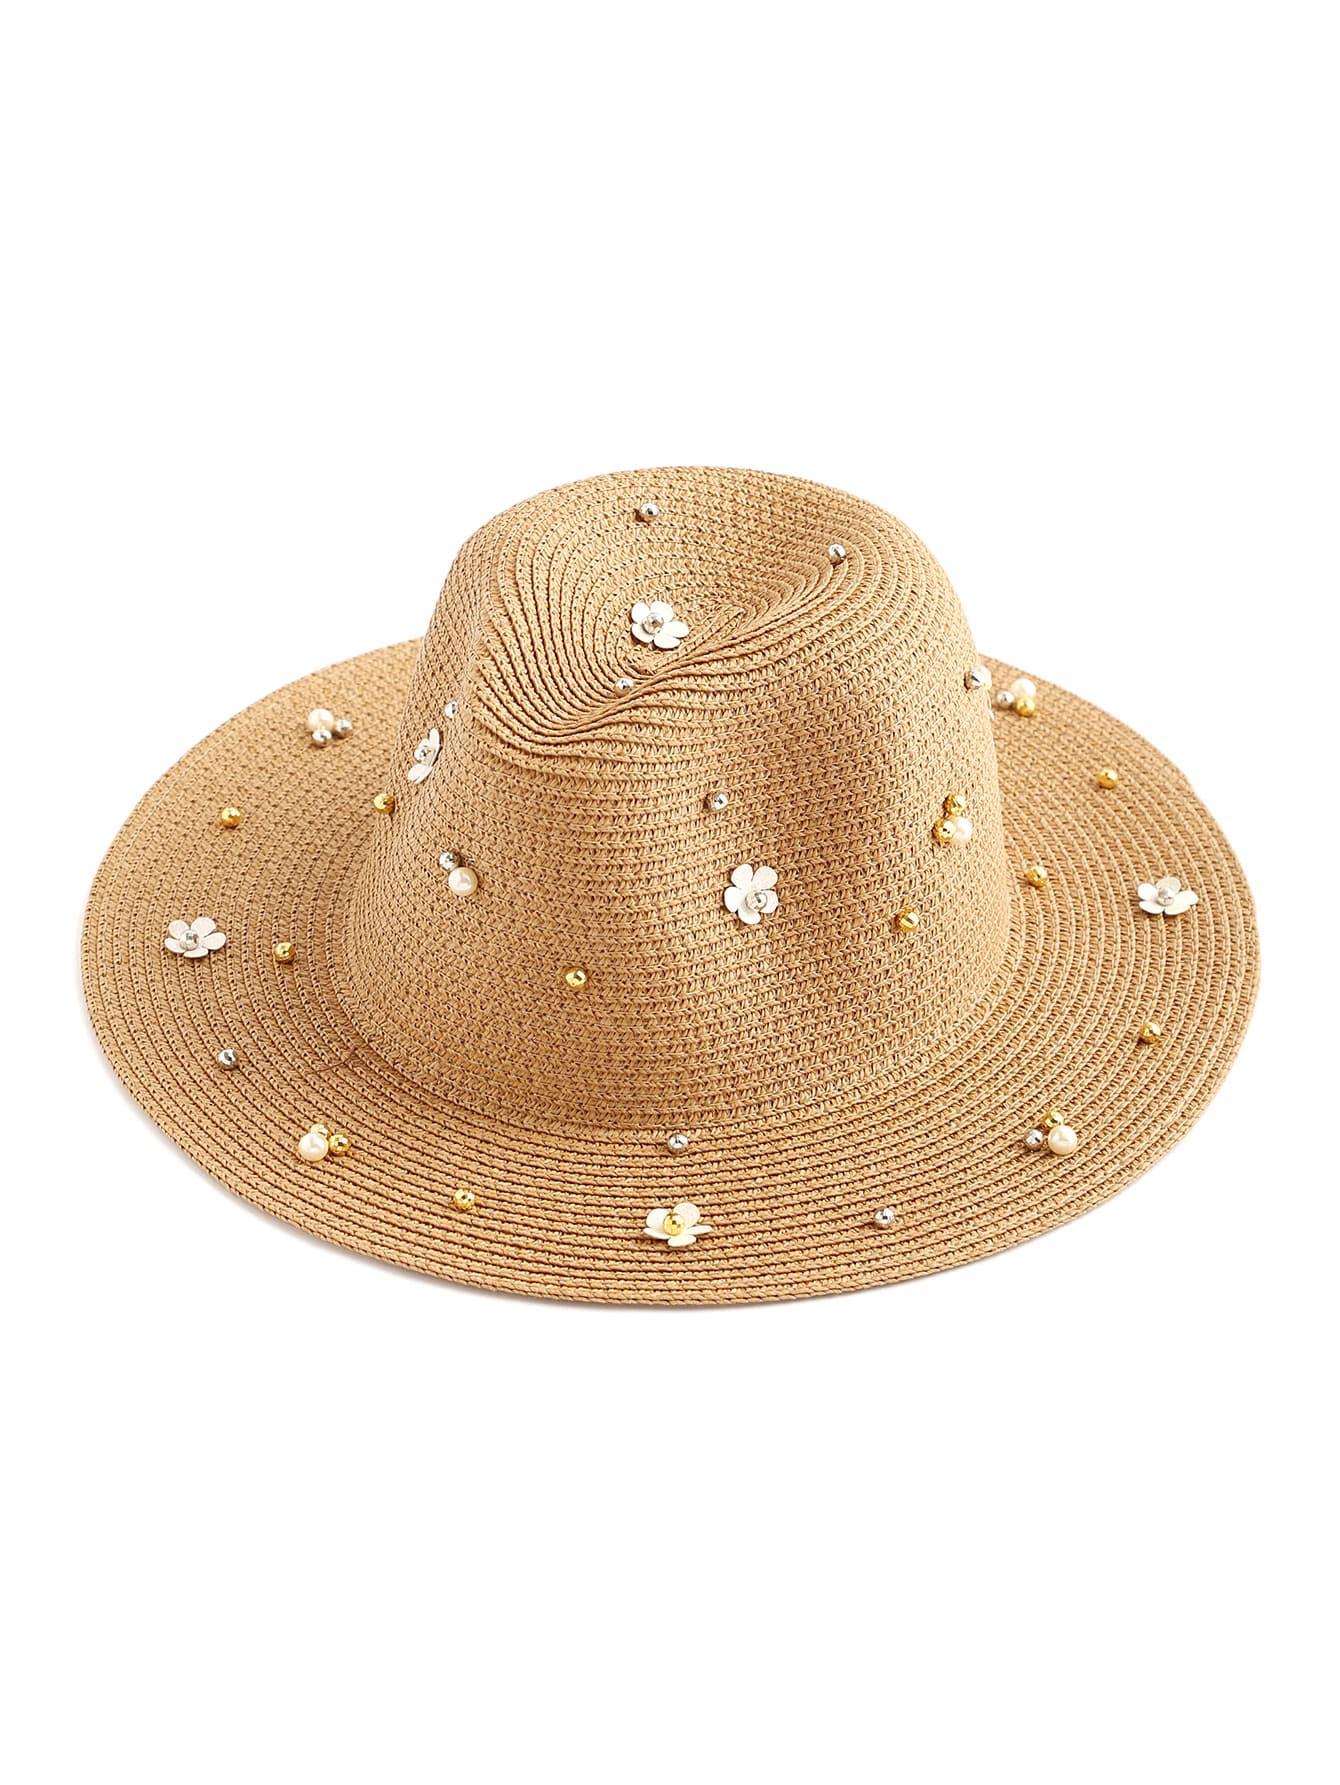 Фото Rivet And Flower Embellished Straw Hat. Купить с доставкой